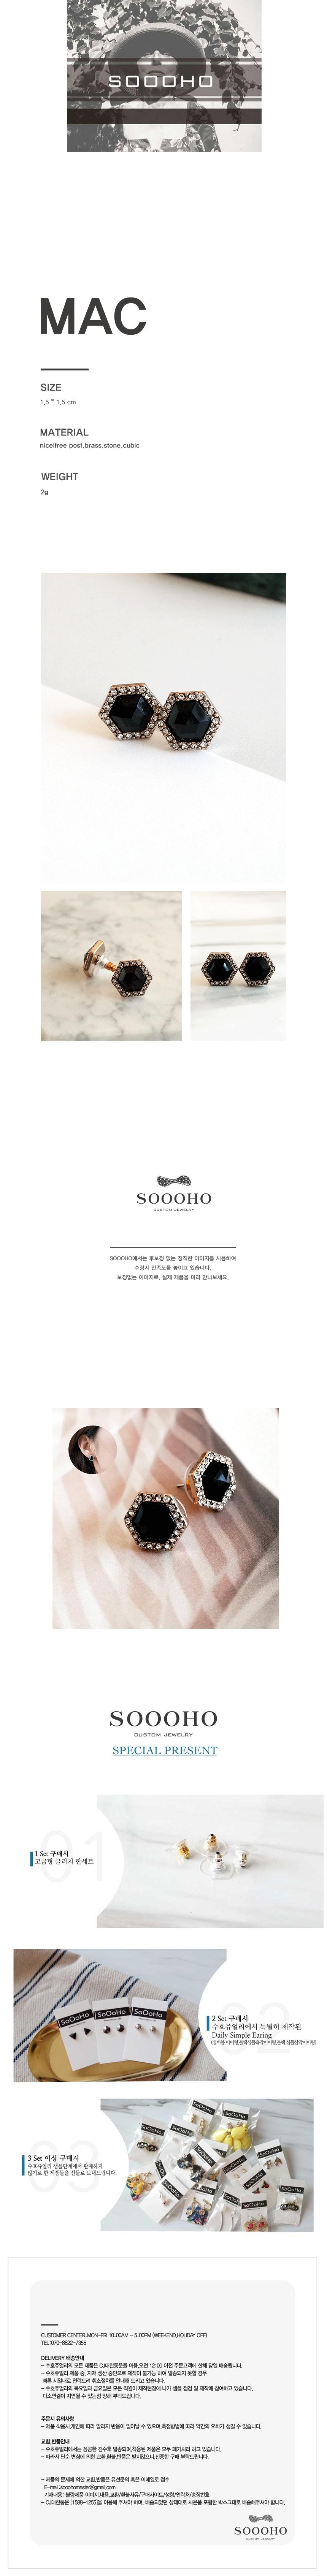 mac - 수호쥬얼리, 14,500원, 골드, 볼/미니귀걸이